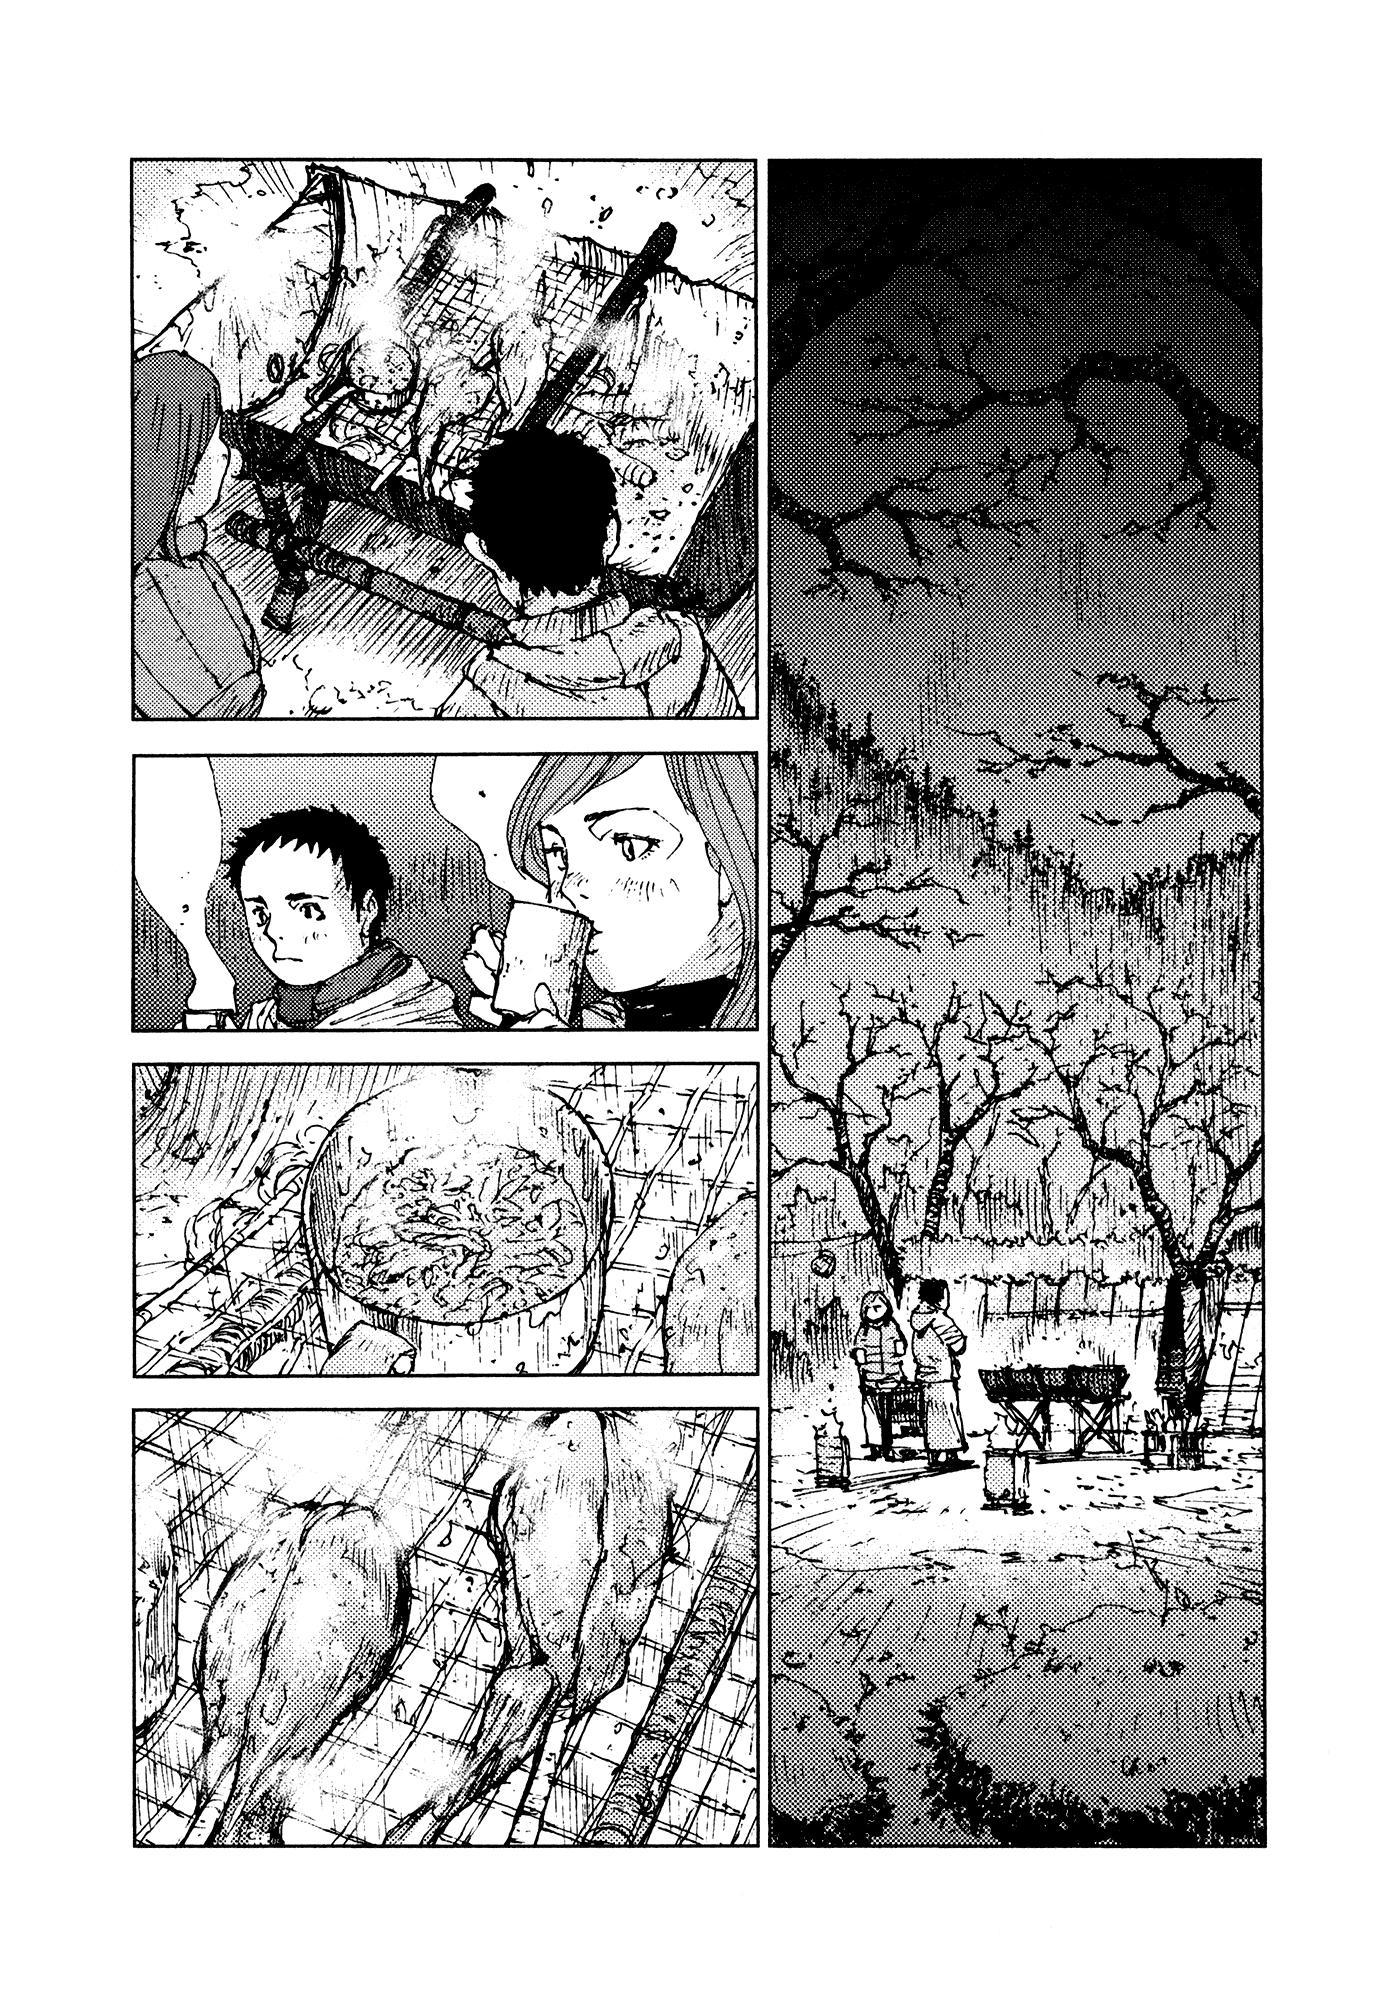 Survival: Shounen S no Kiroku - Chapter 49